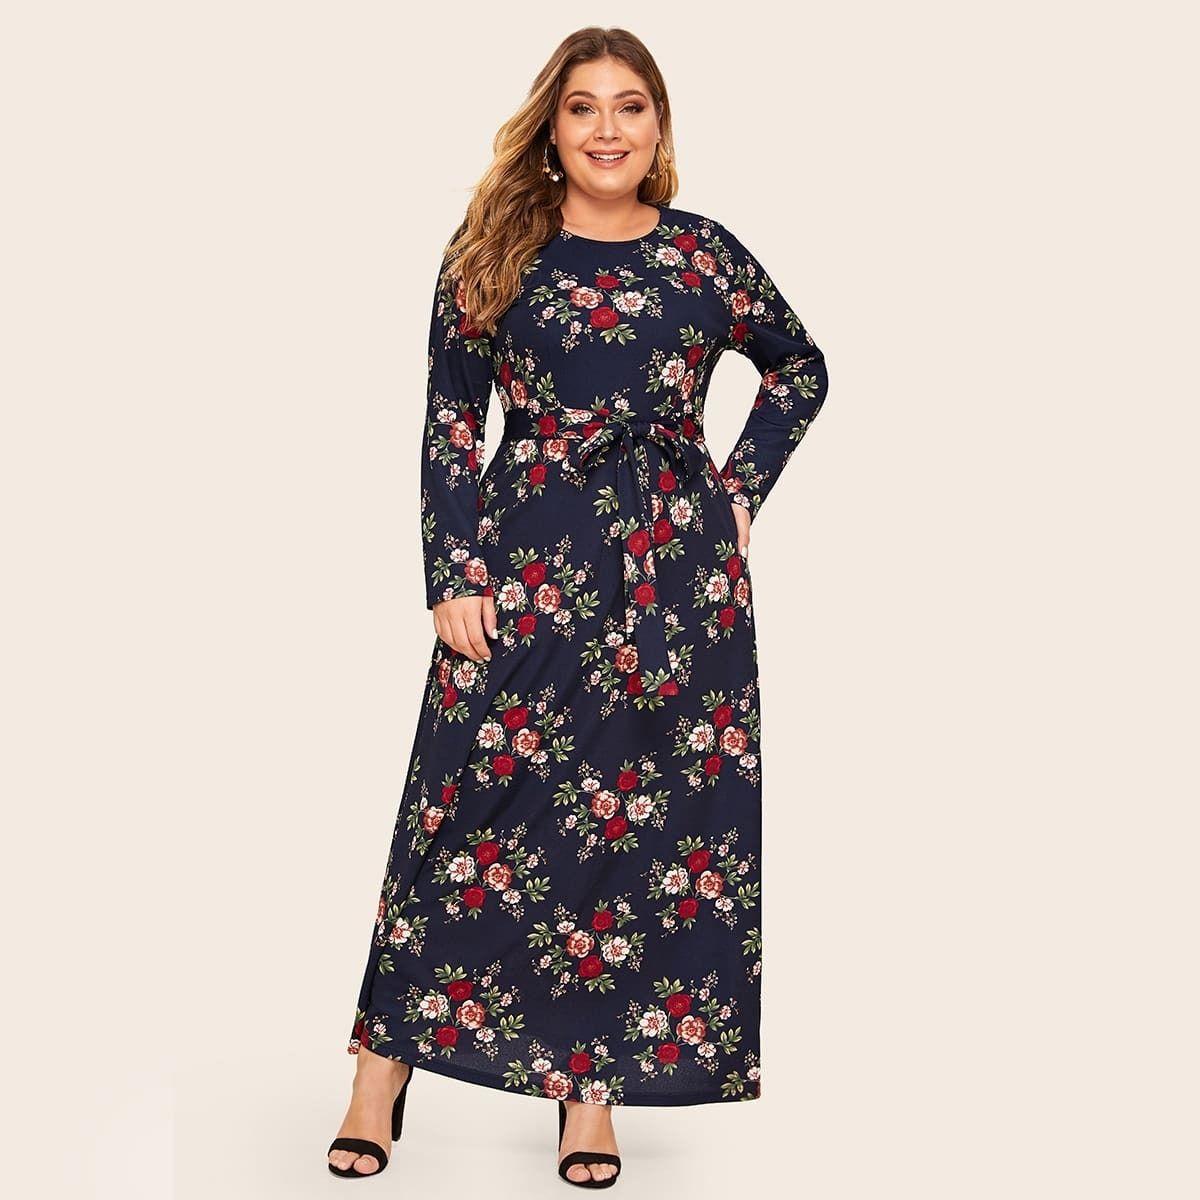 13 00 Vestido Con Cinturon Con Estampado Floral Grande Shein Tallas Grandes Mujer Ves Plus Size Dresses Belted Floral Dress Butterfly Print Dress